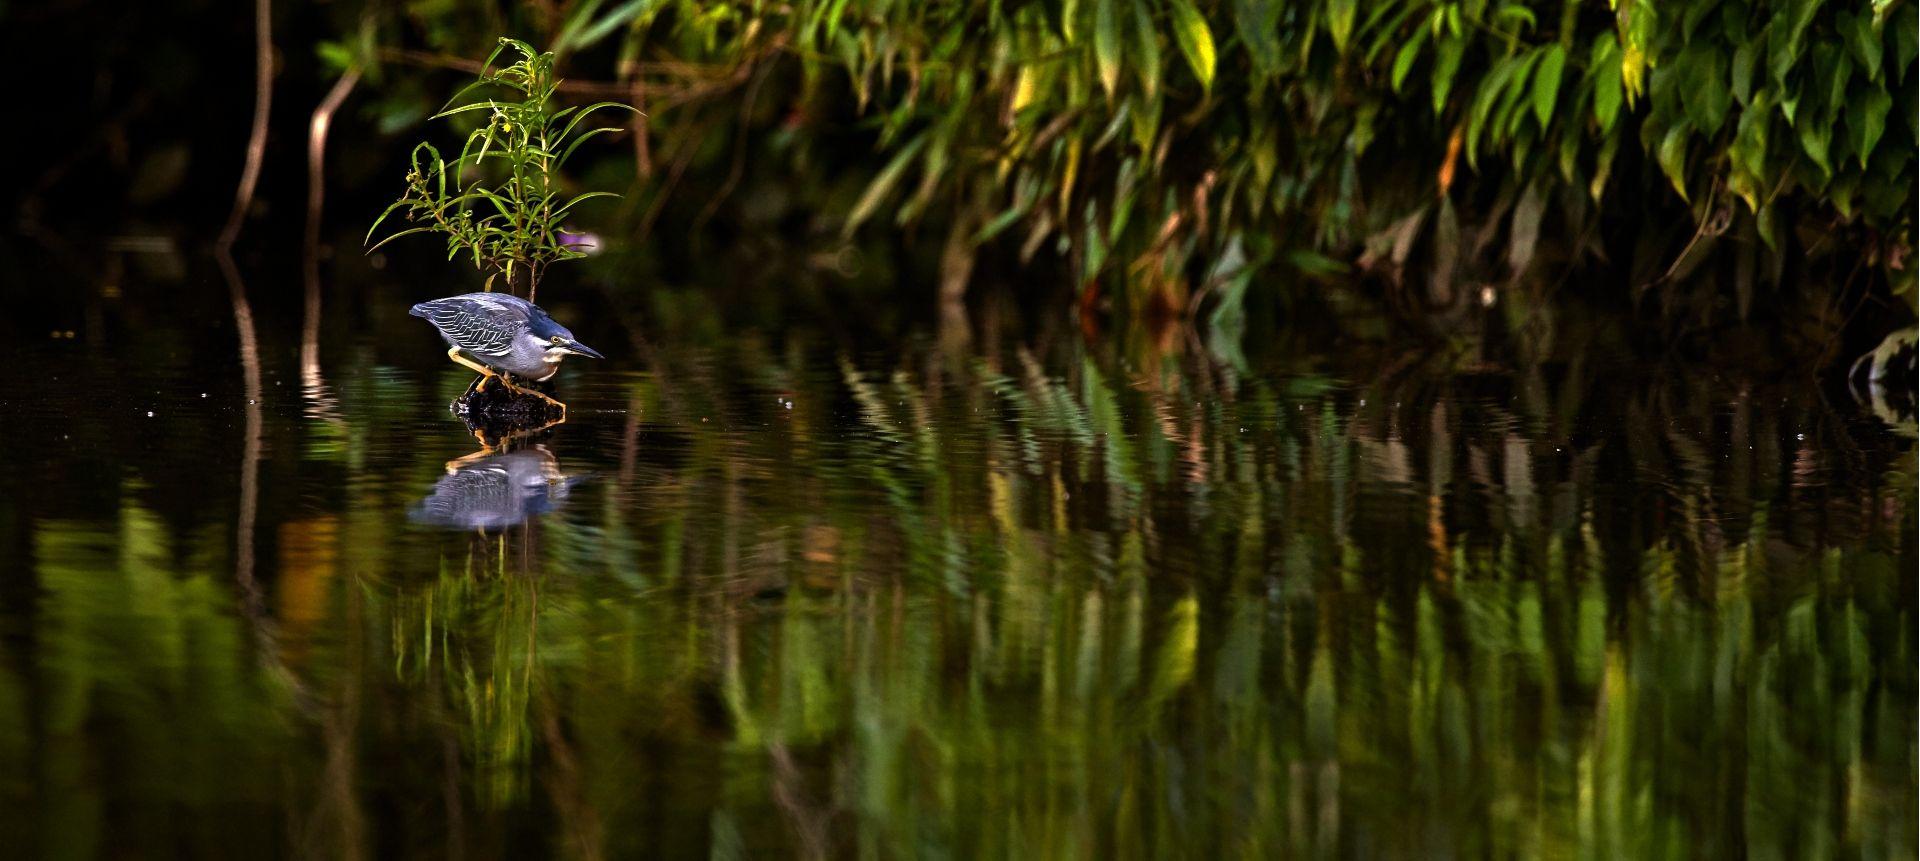 Fishing in the Amazon – (Photo Credit: Paul Bertner)